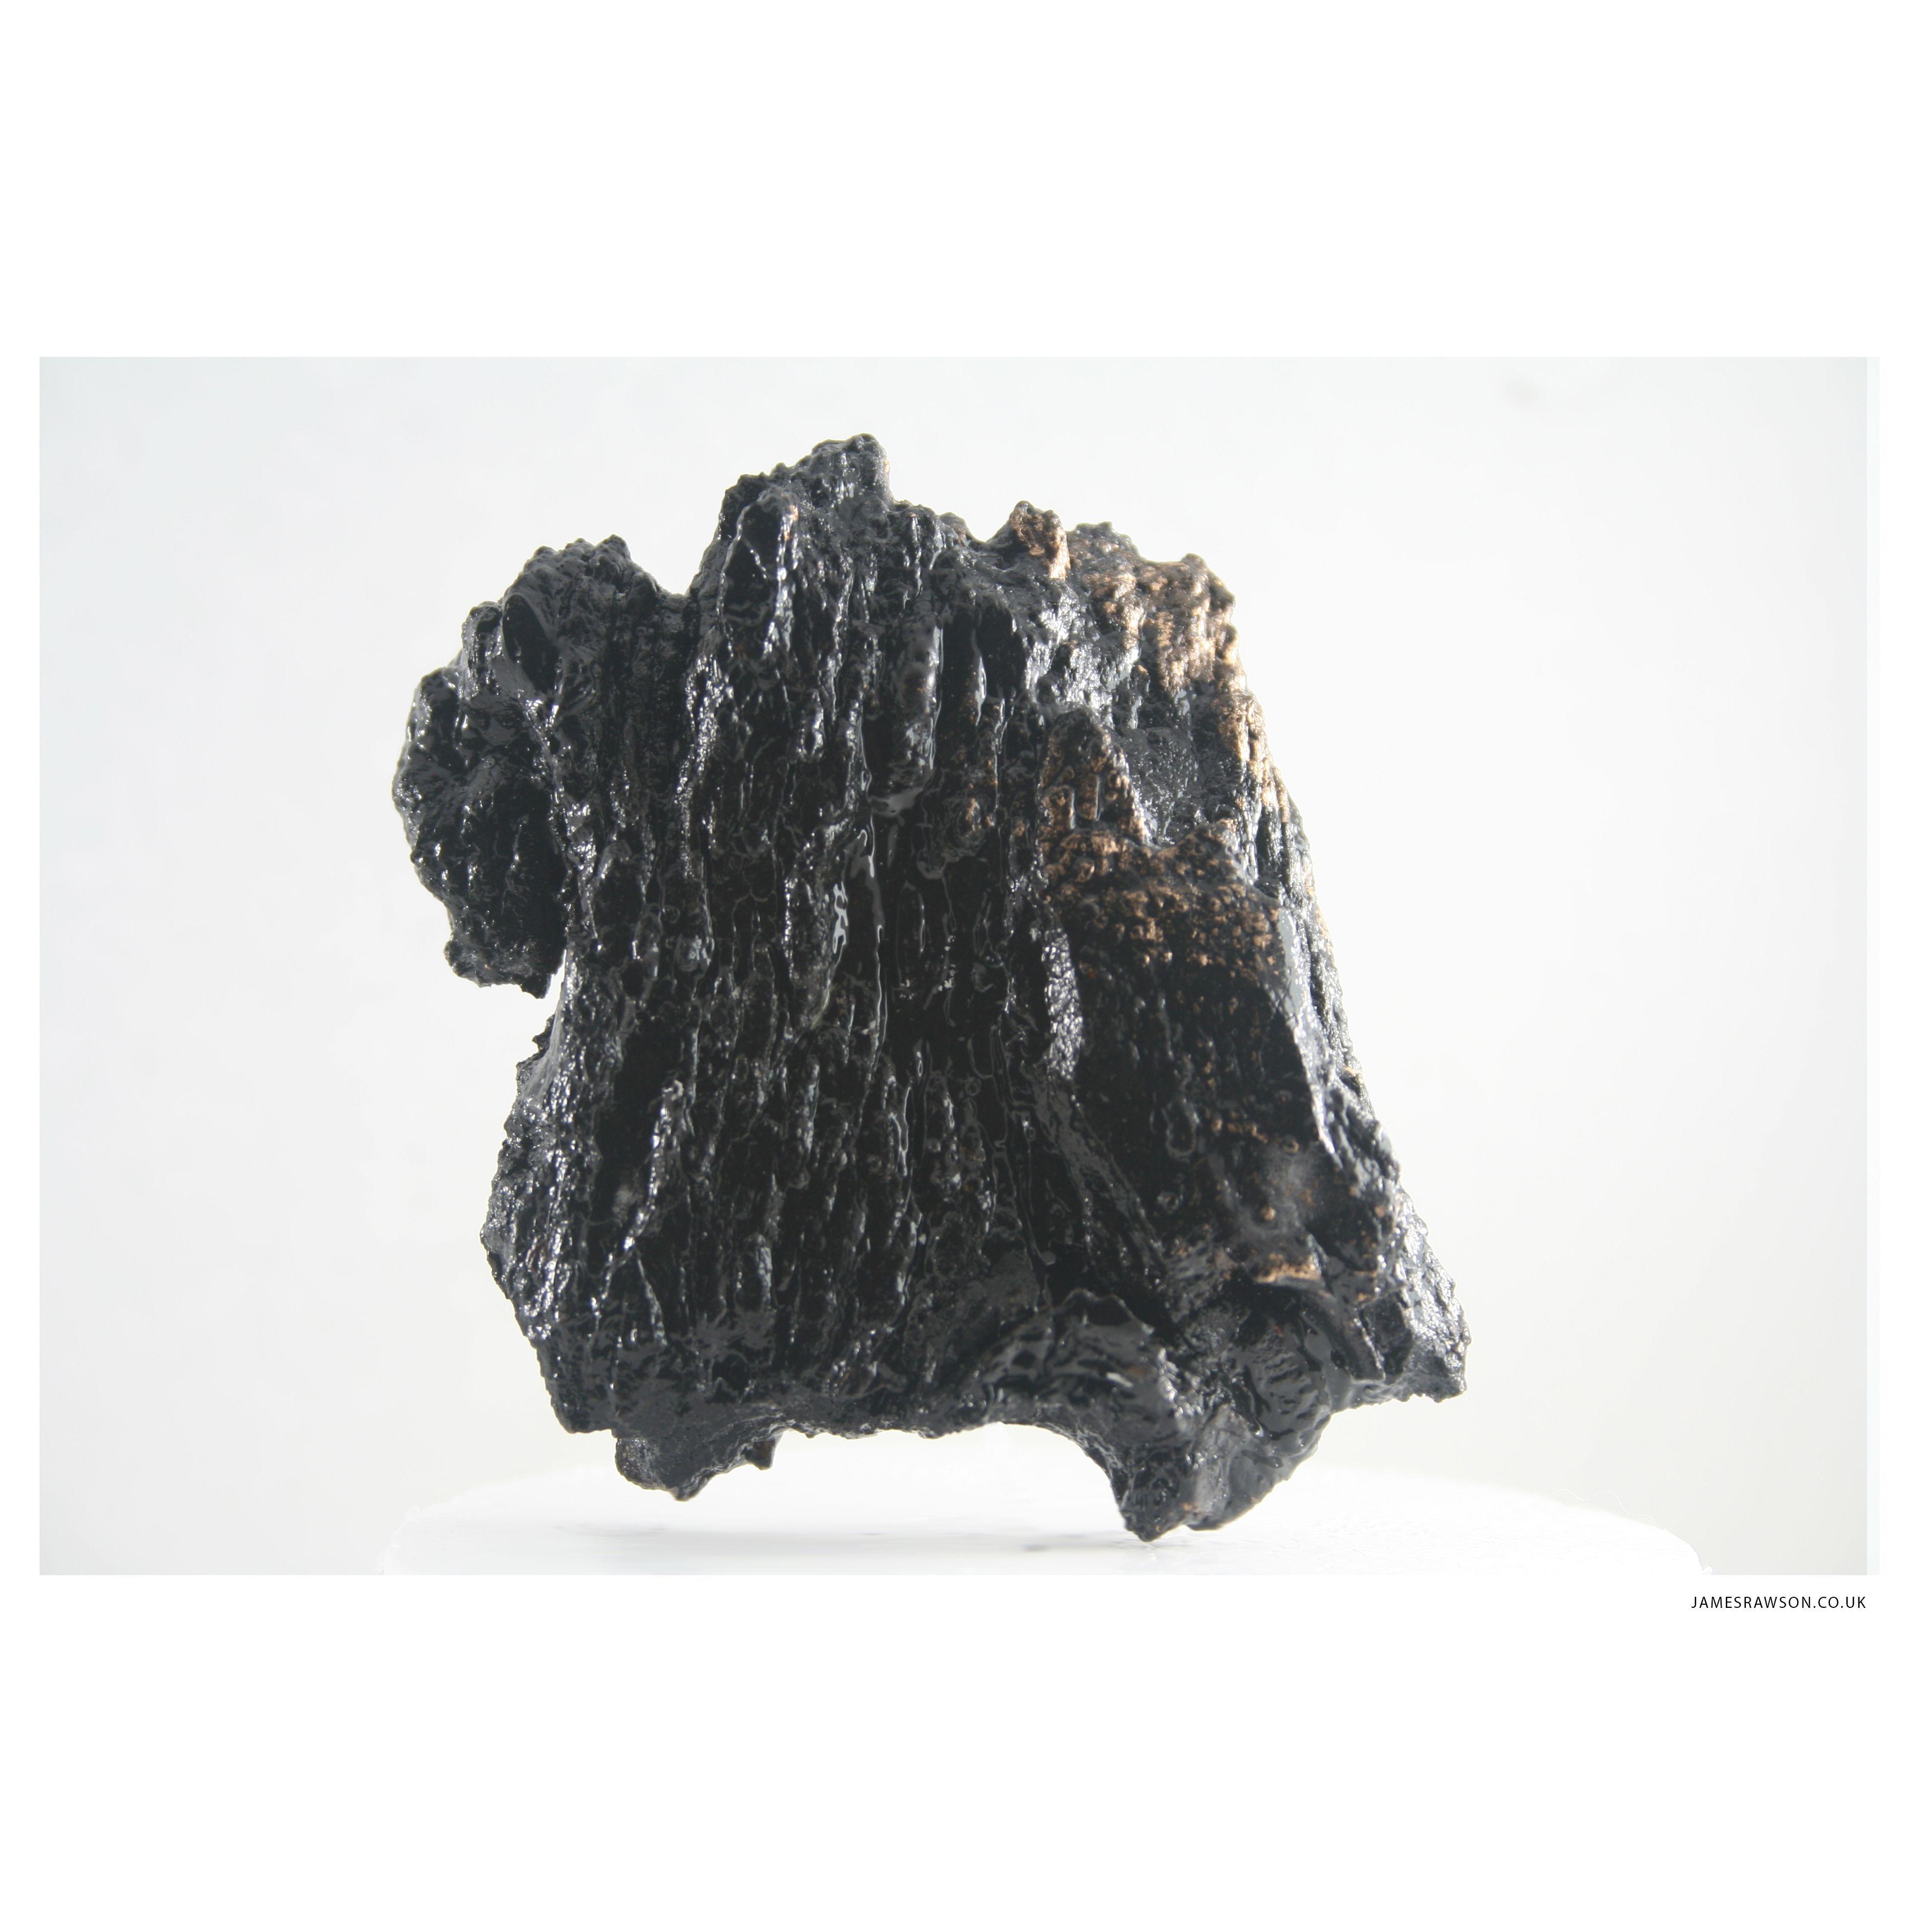 James rawson sculpture contemporary artwork sculpture